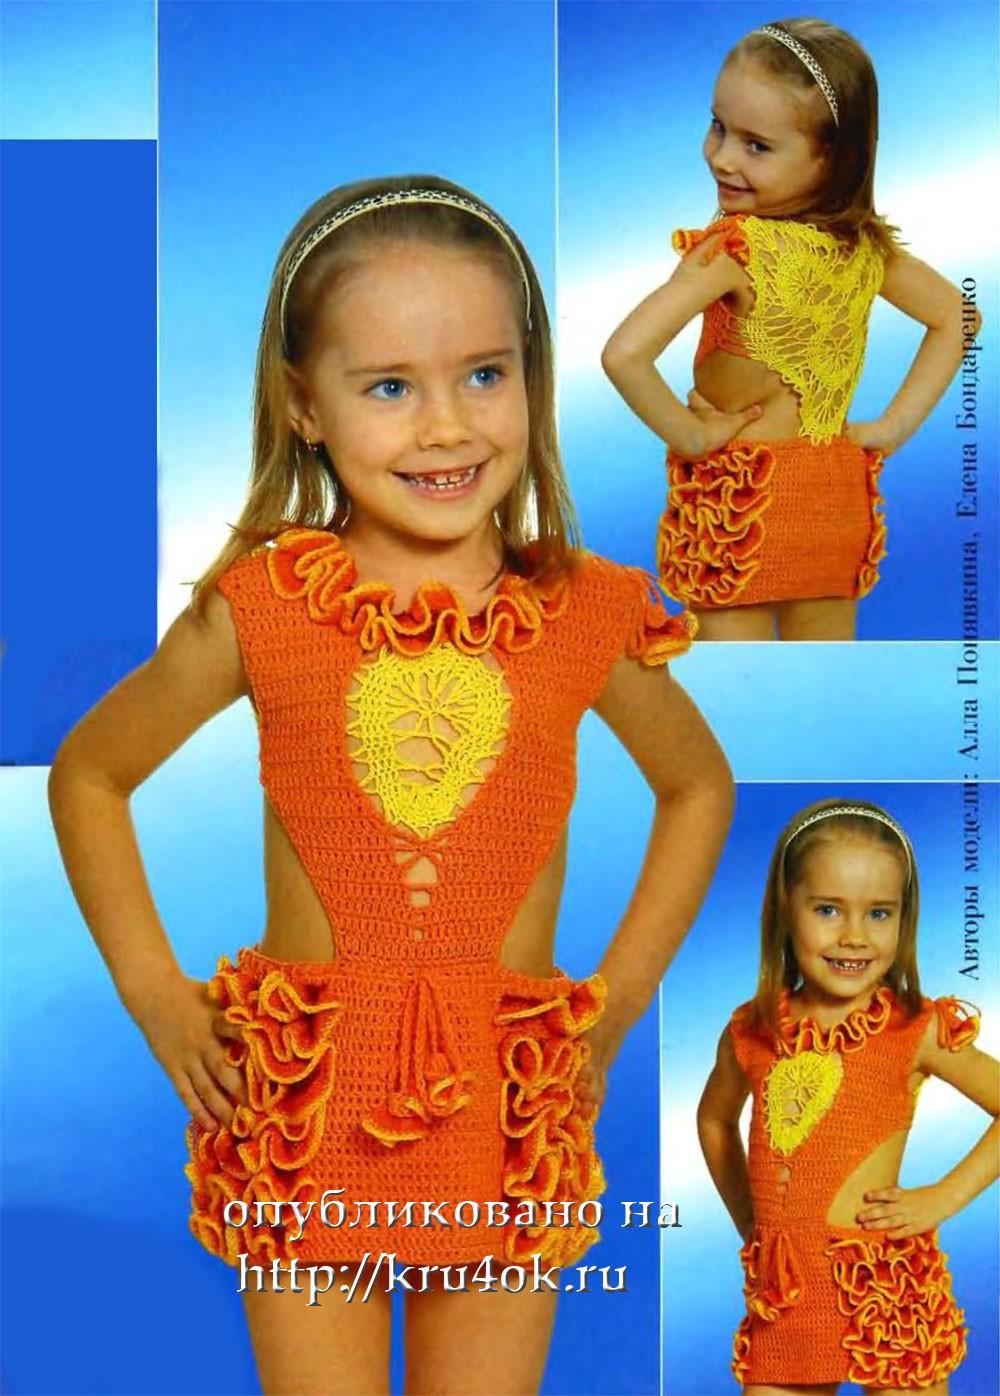 http://kru4ok.ru/wp/wp-content/uploads/2010/05/kapriz_apelsin1.jpg